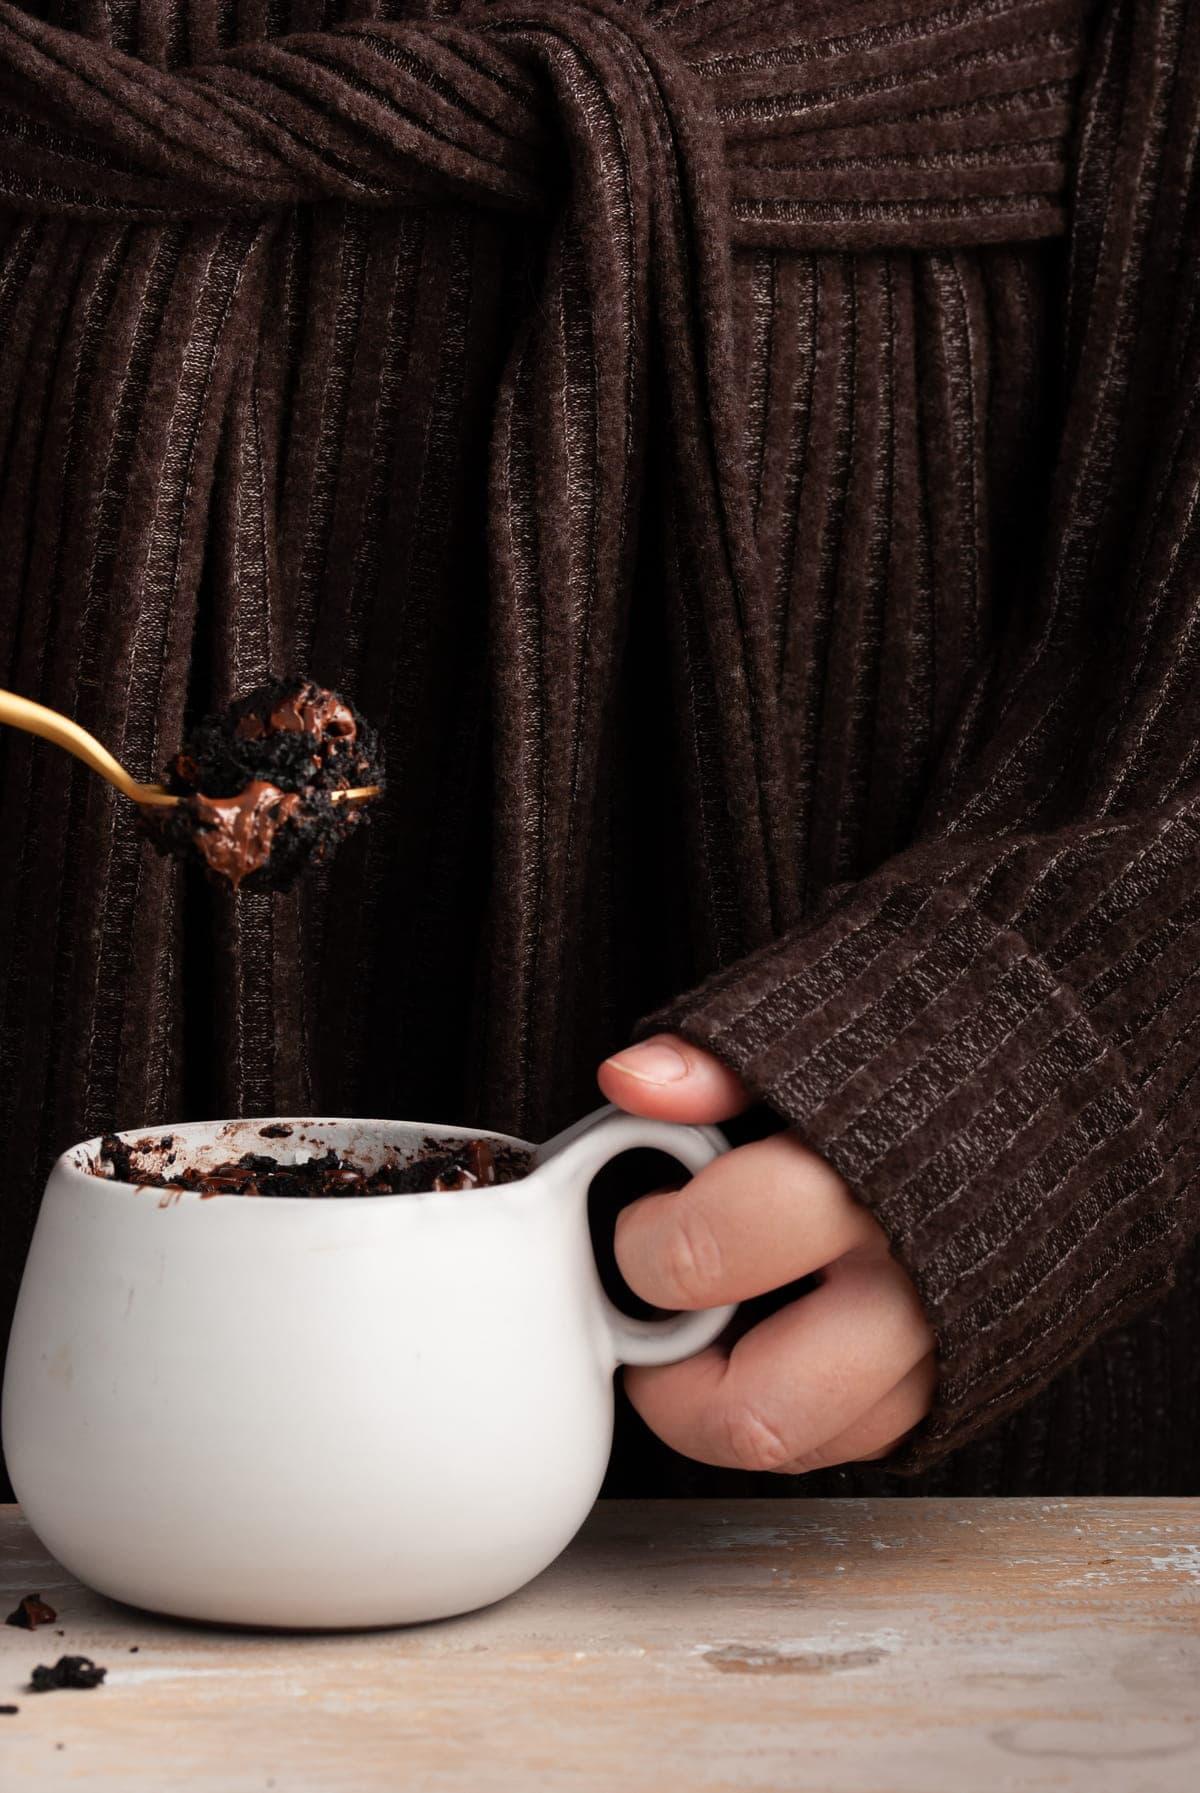 Taking a bite of vegan mug brownie on a gold spoon